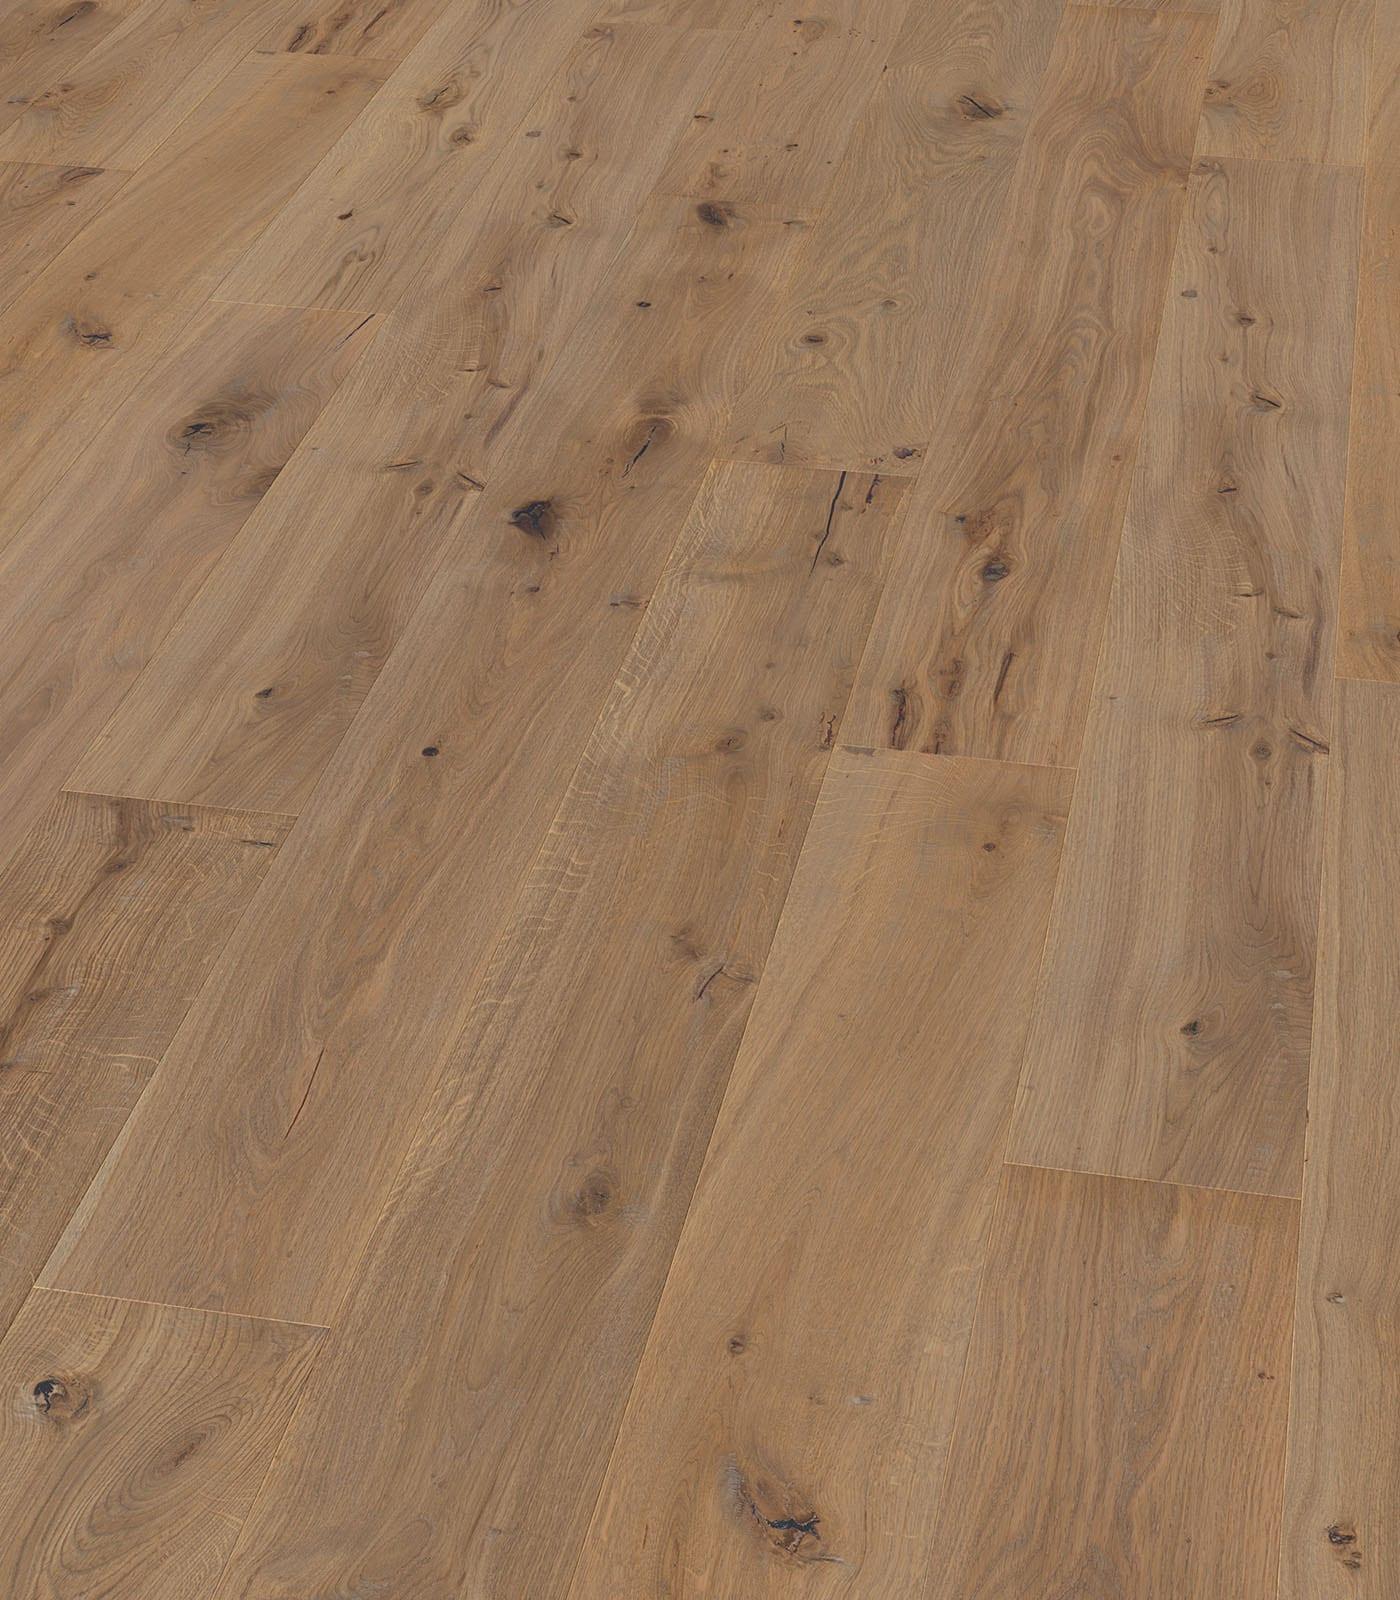 Barbados-Lifestyle Collection-European Oak floors-angle